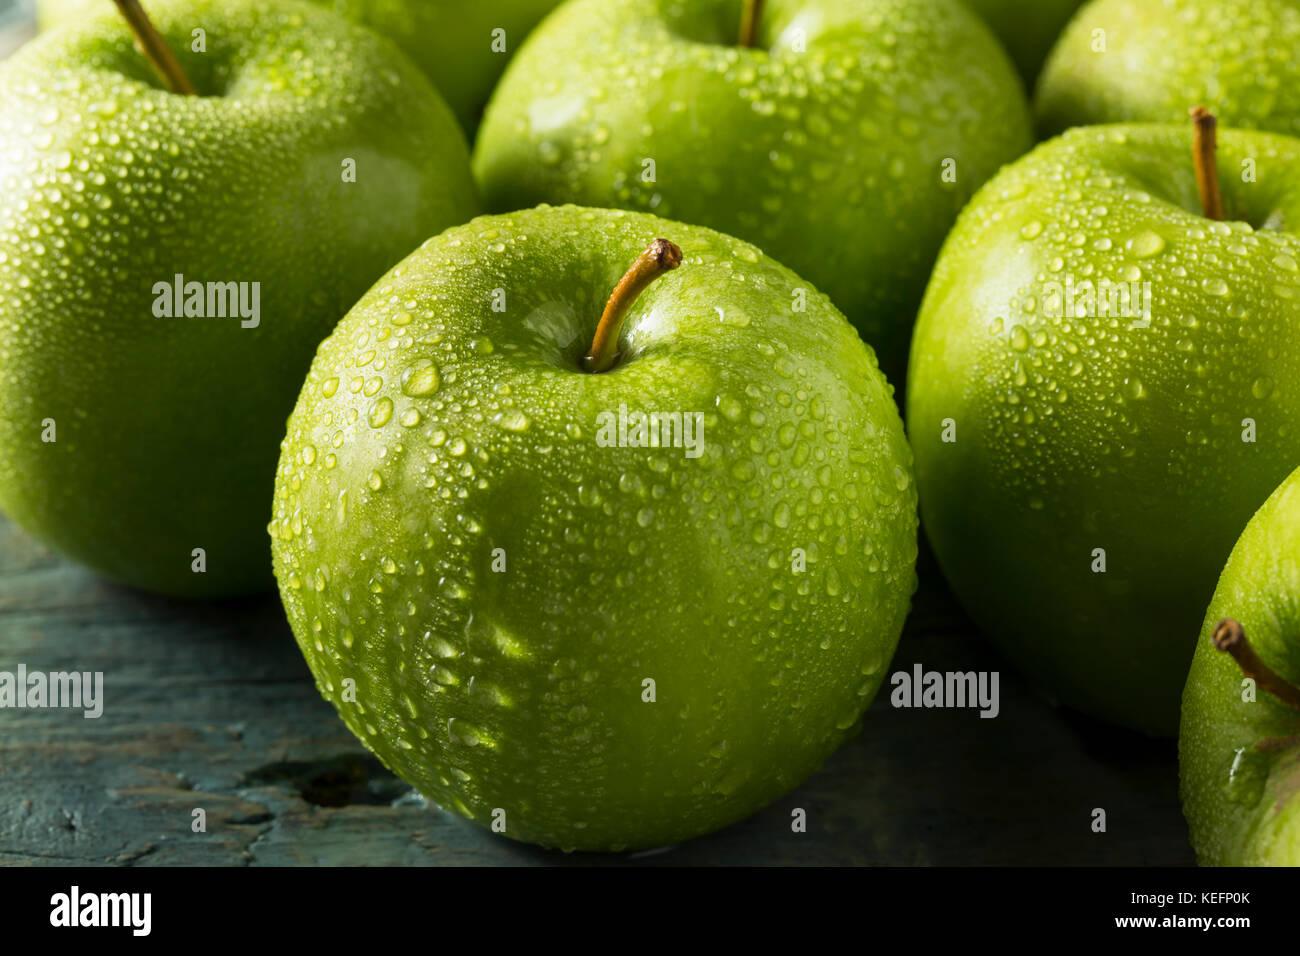 Raw Green Organic Granny Smith Apples Ready to Eat - Stock Image